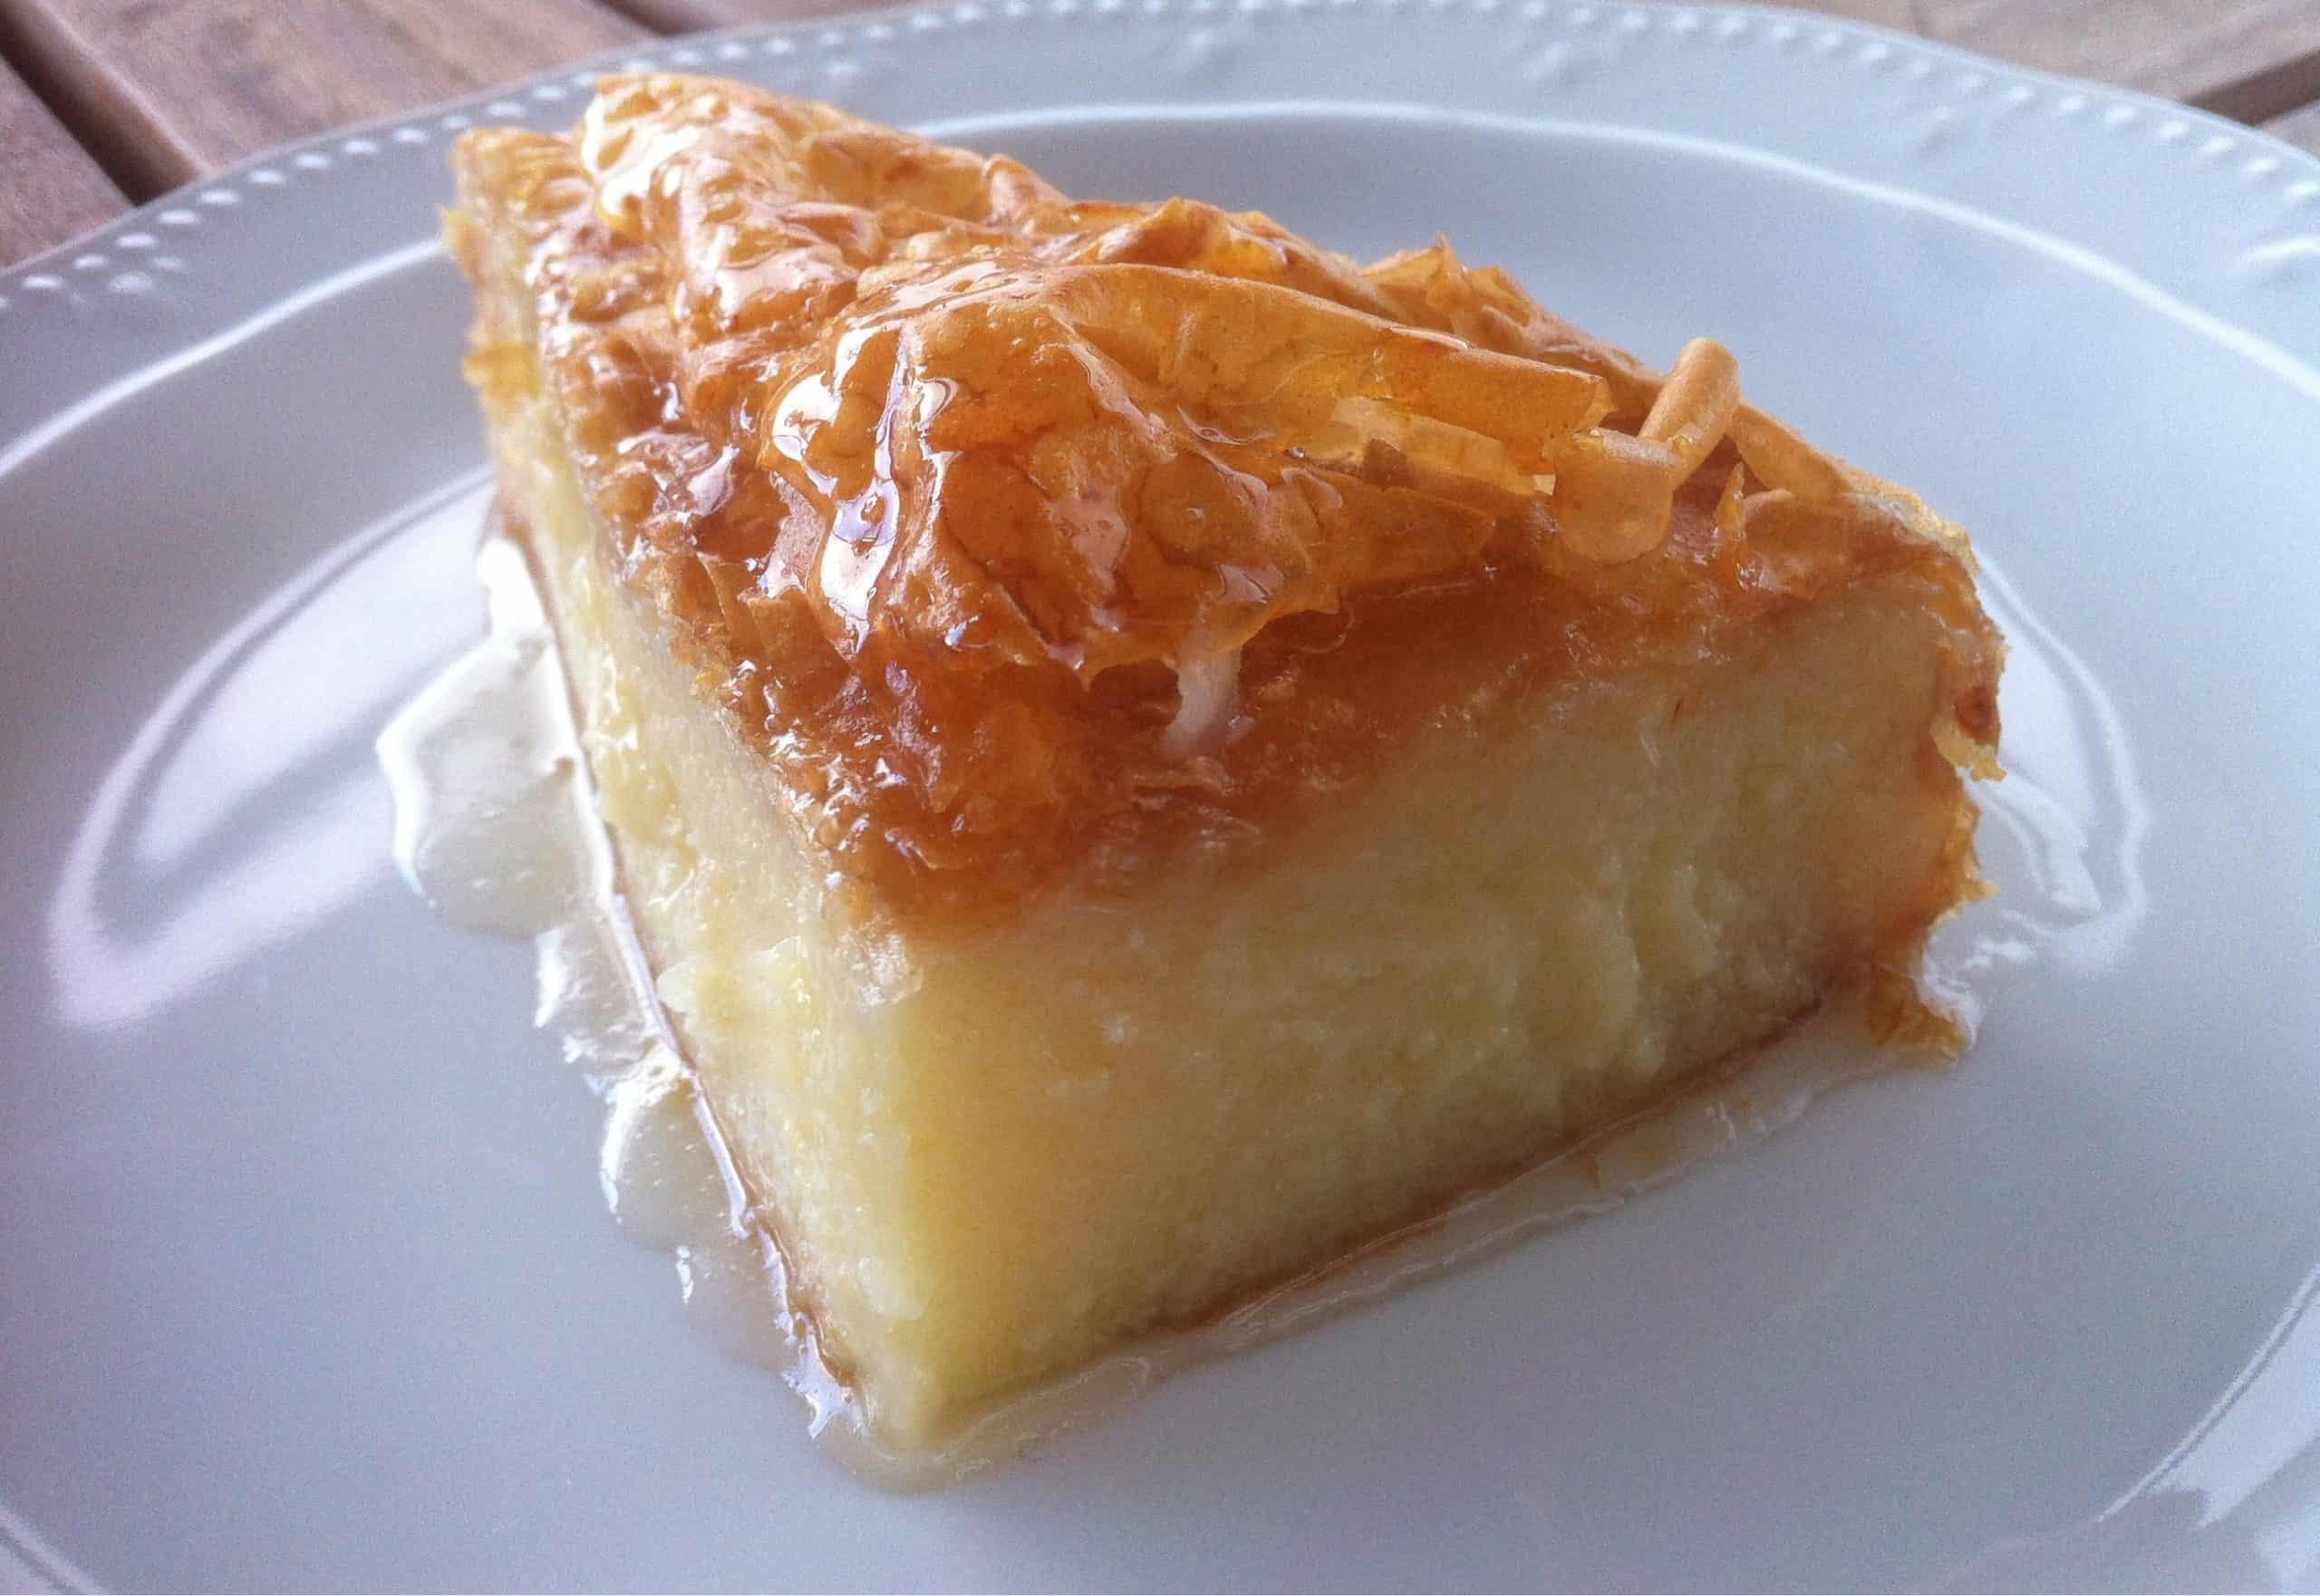 Traditional Greek Galaktoboureko Recipe Greek Custard Pie With Syrup My Greek Dish